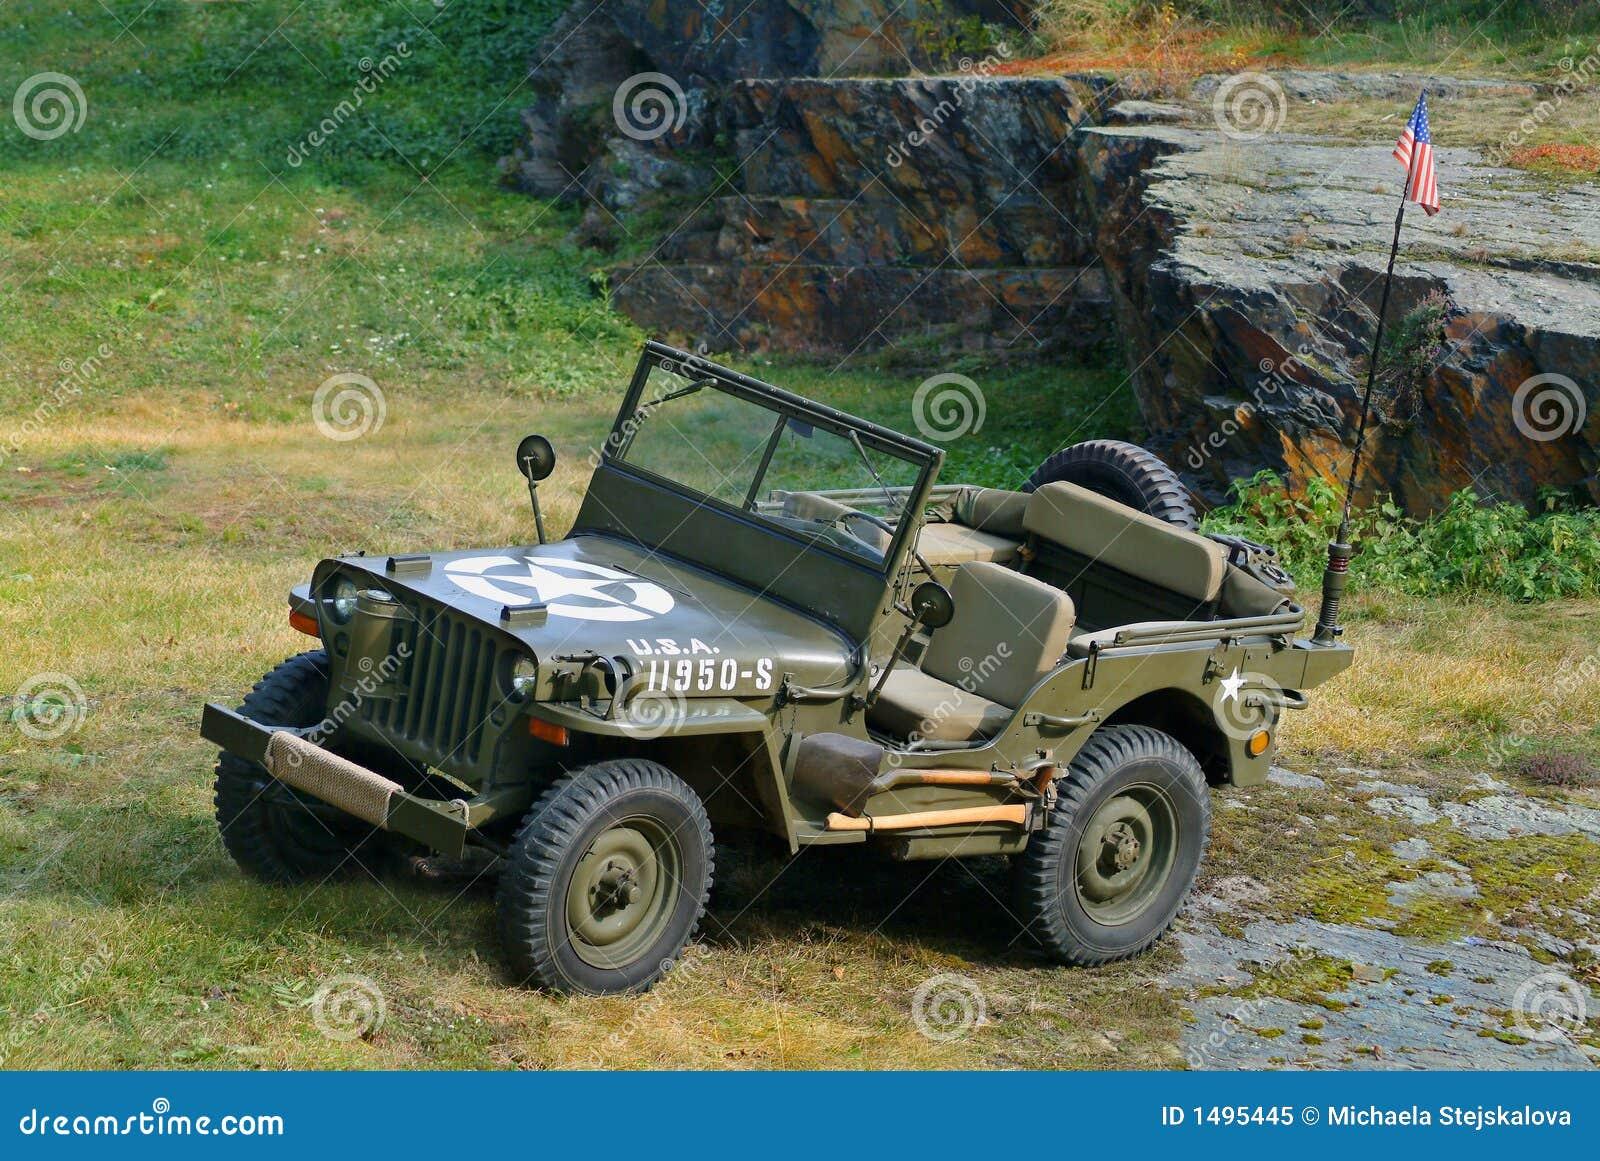 jeep willys 1944 photo libre de droits image 1495445. Black Bedroom Furniture Sets. Home Design Ideas